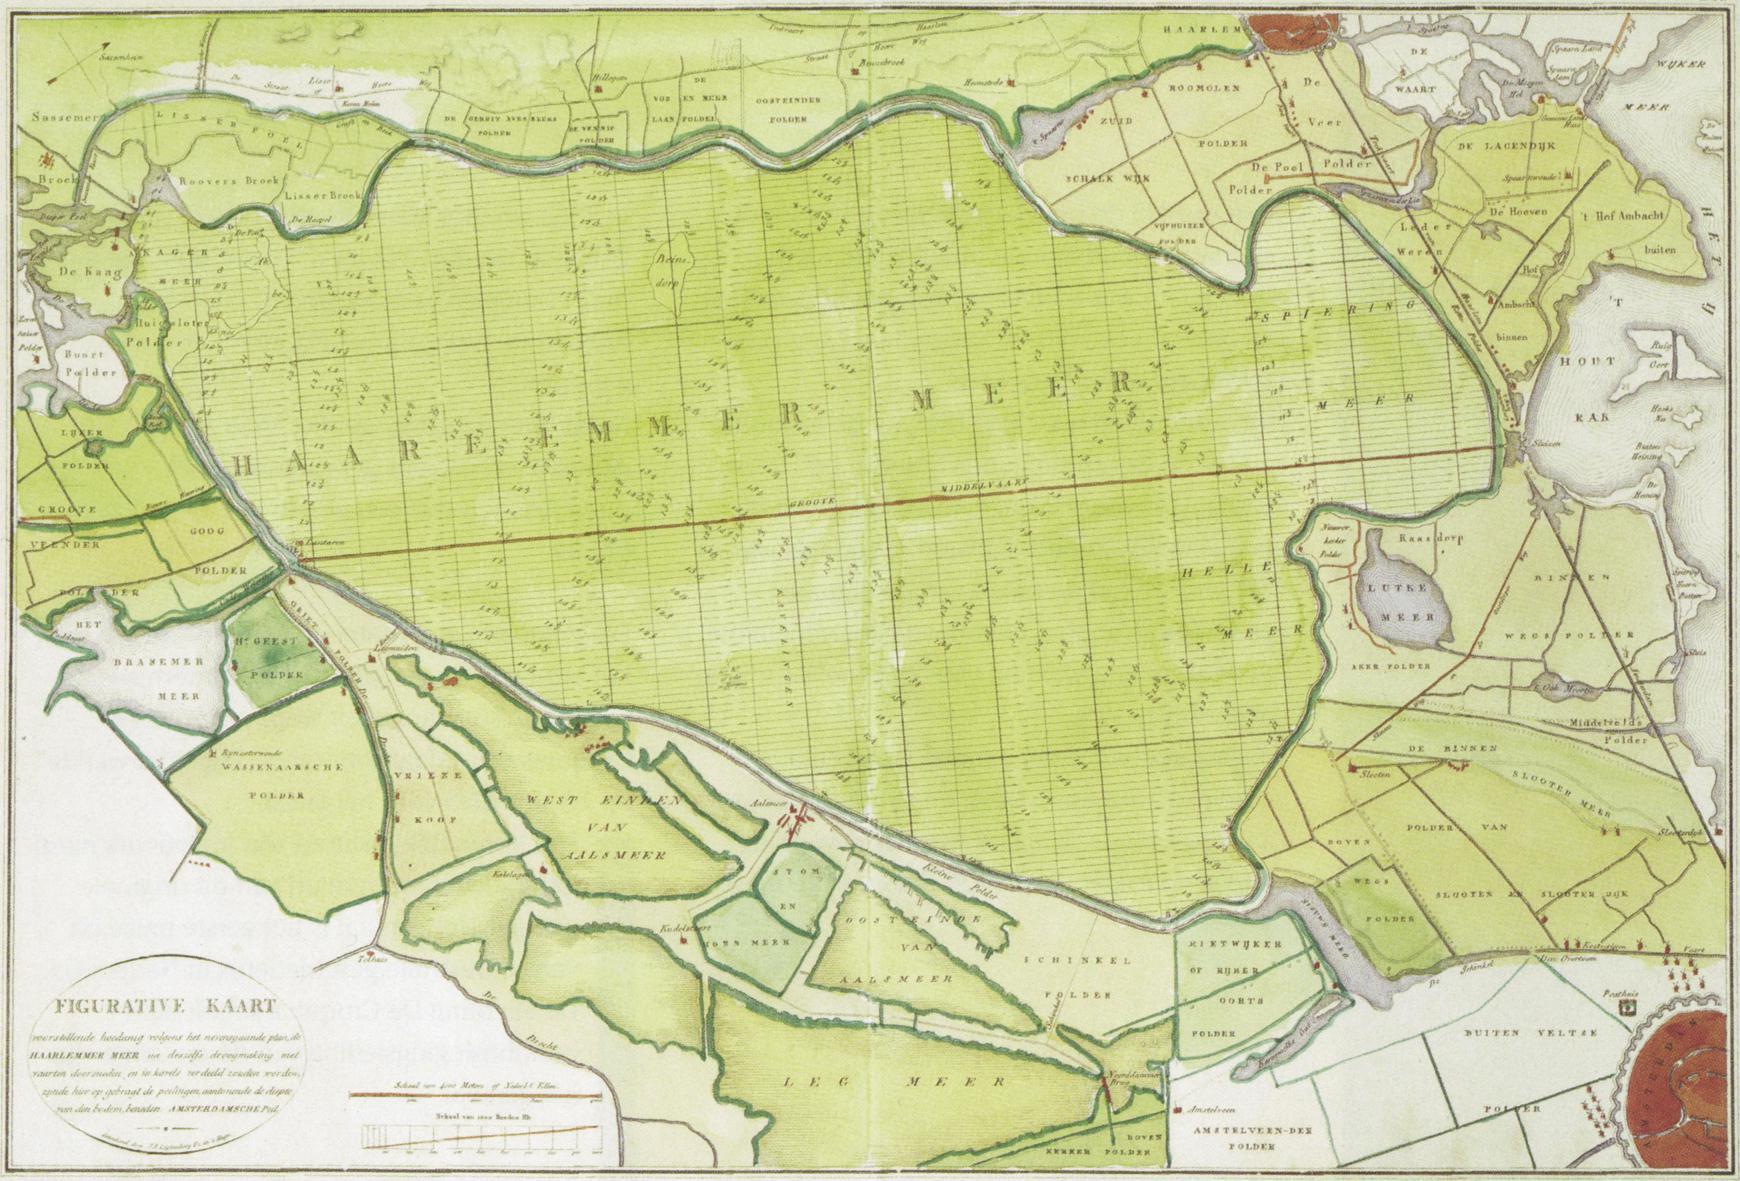 11. Droogmakingsplan van Lynden van Hemmen 1822